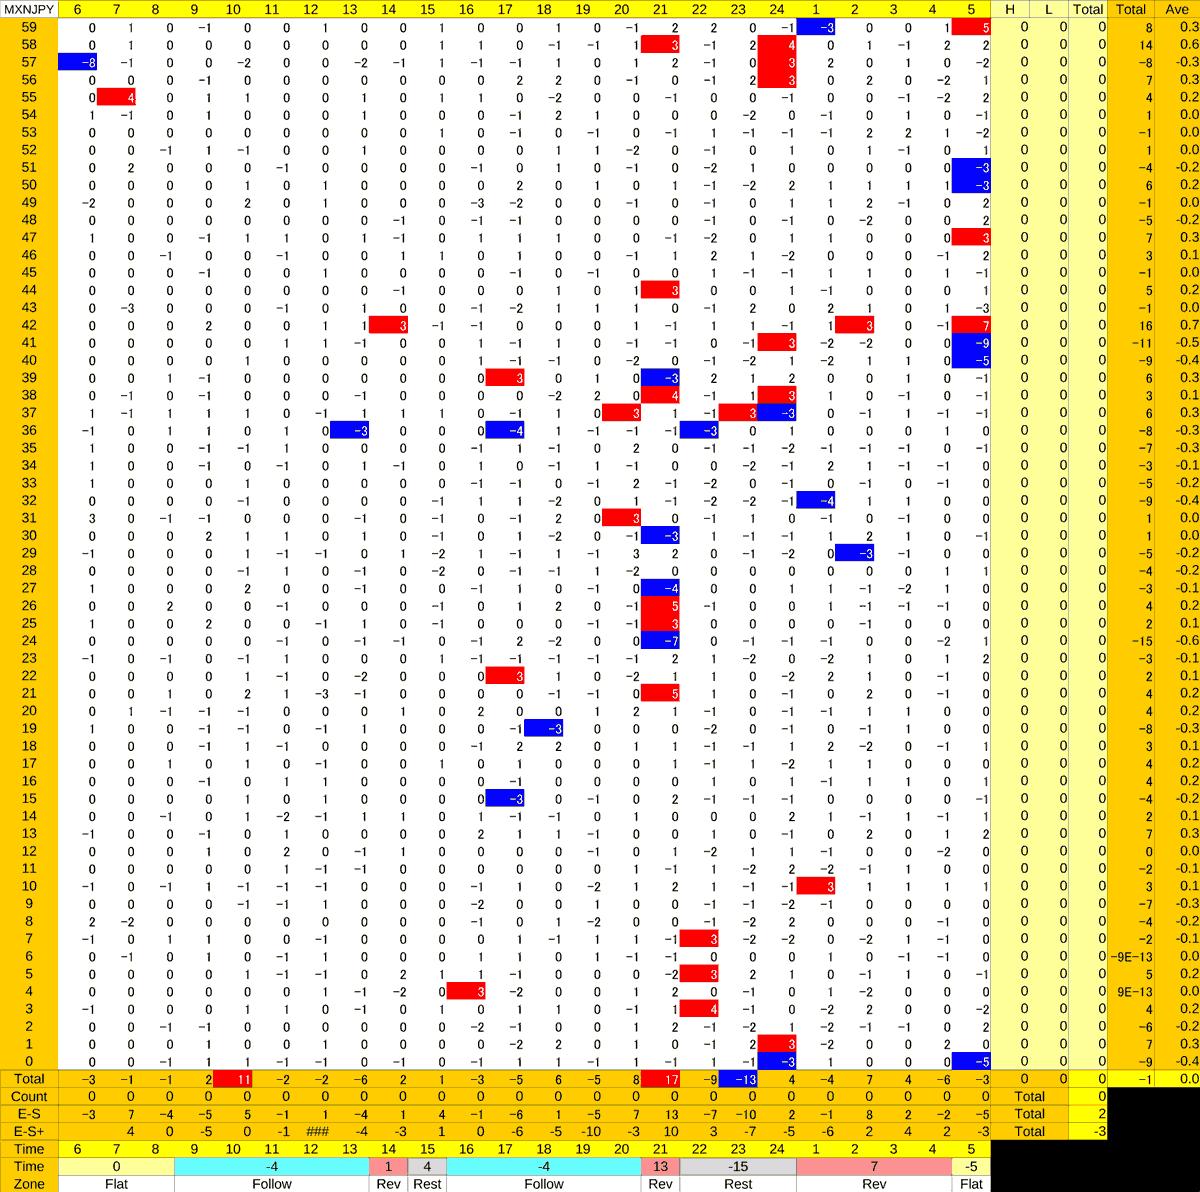 20201203_HS(3)MXNJPY